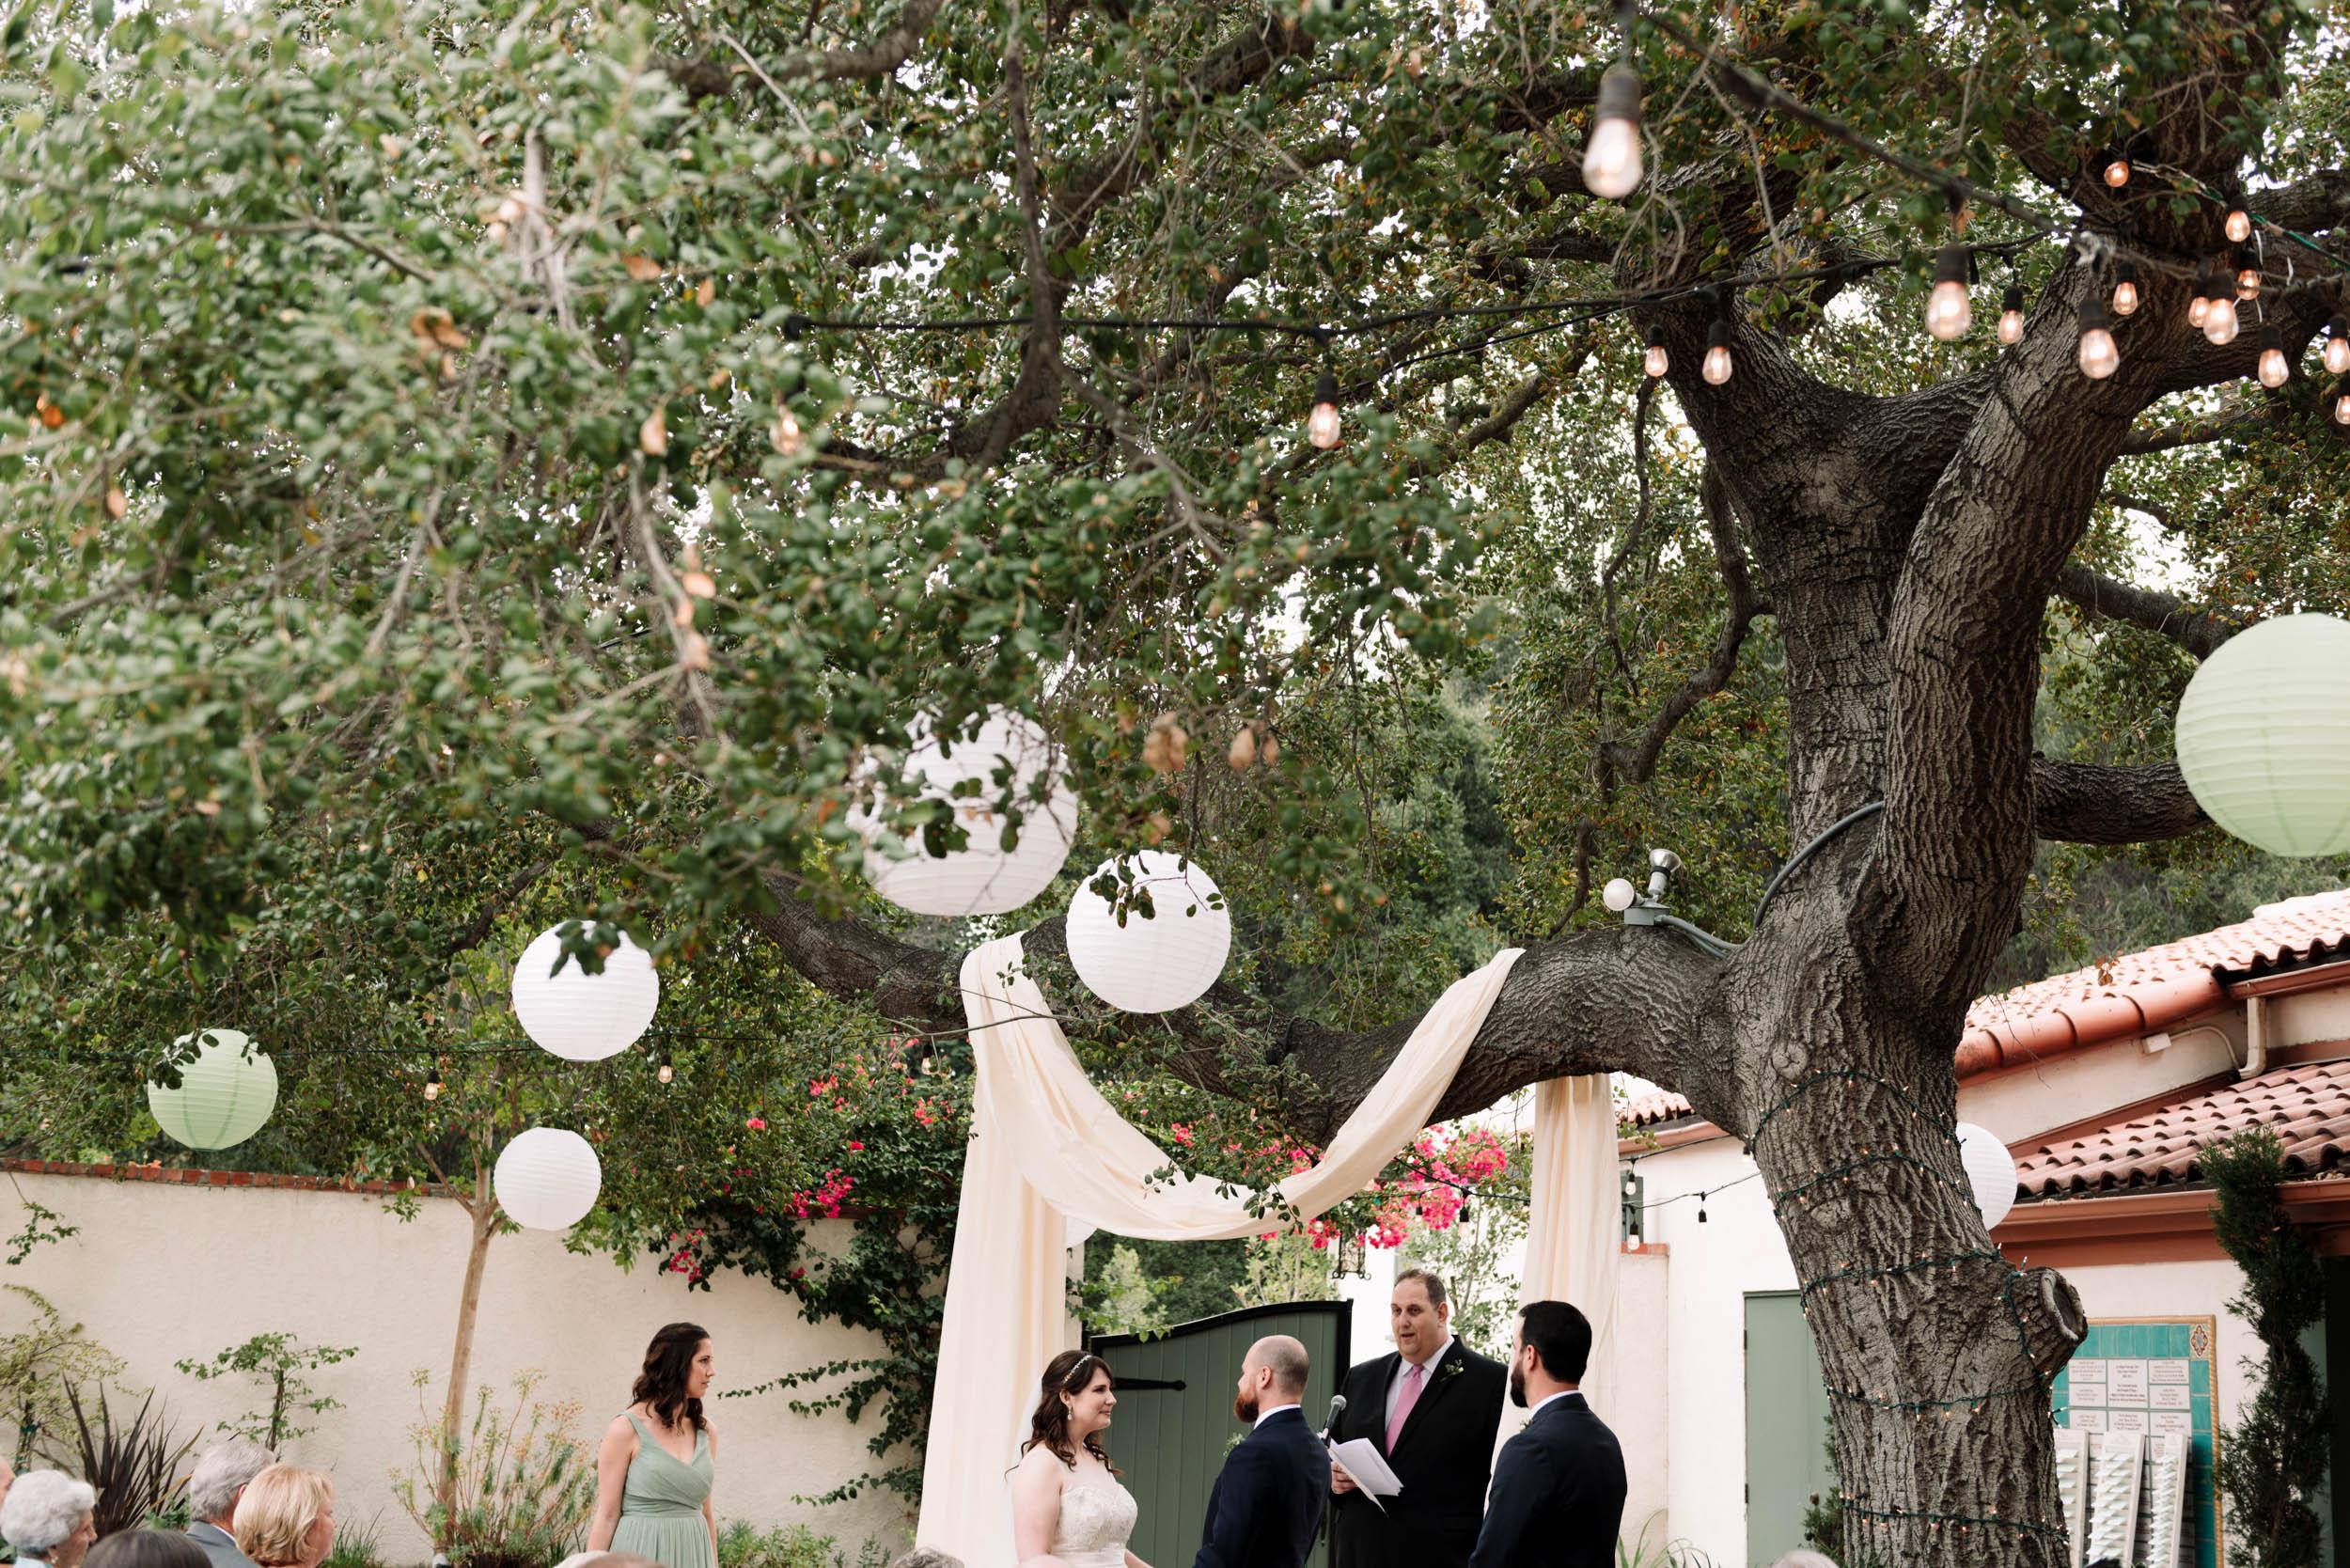 Desination_Wedding_Los Angeles-10_belle&sass.jpg